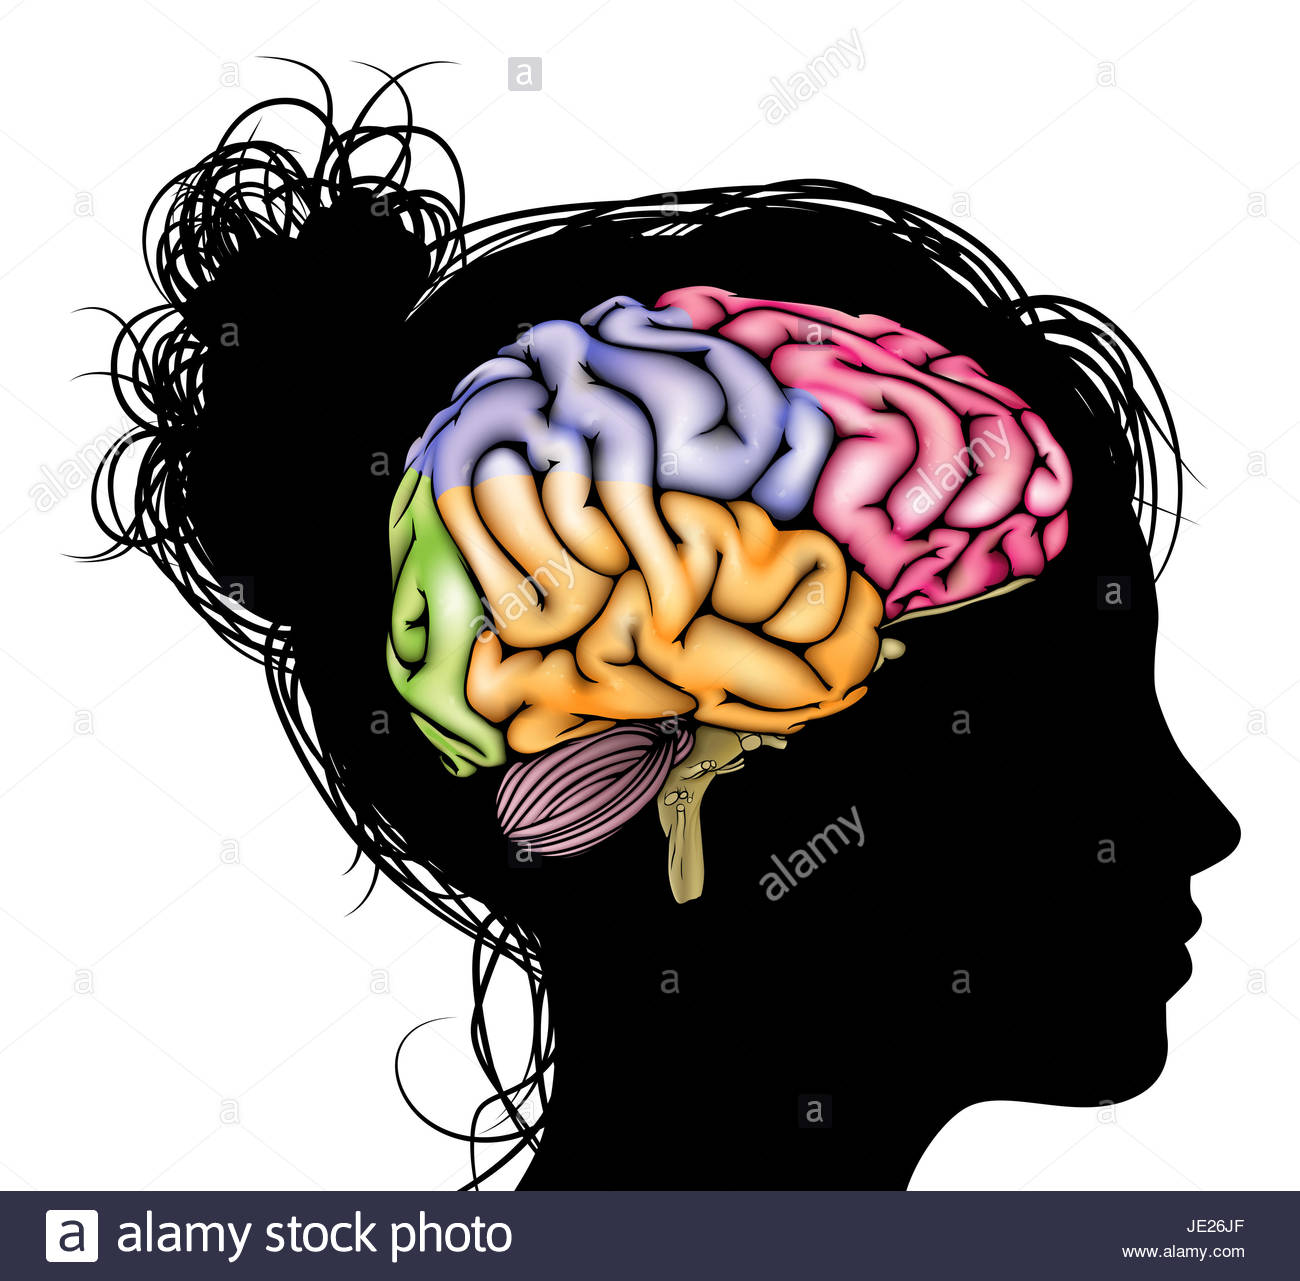 Silhouette Brain